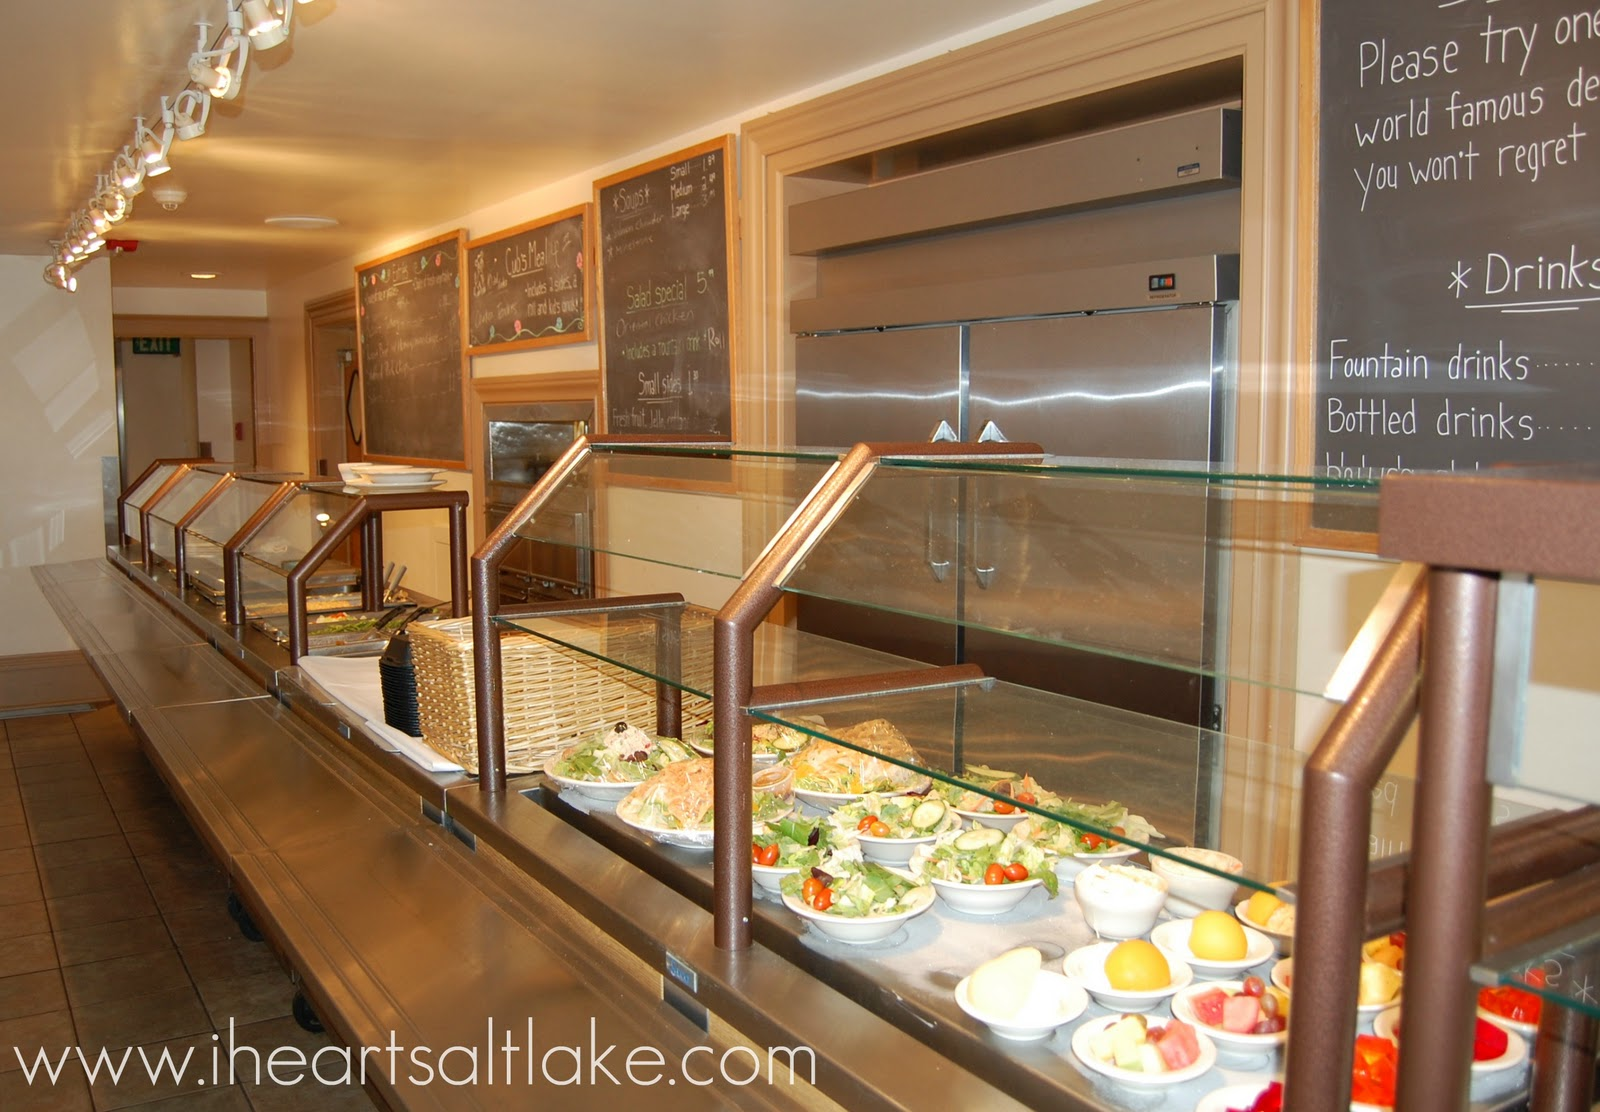 The Lion House Cafe Salt Lake